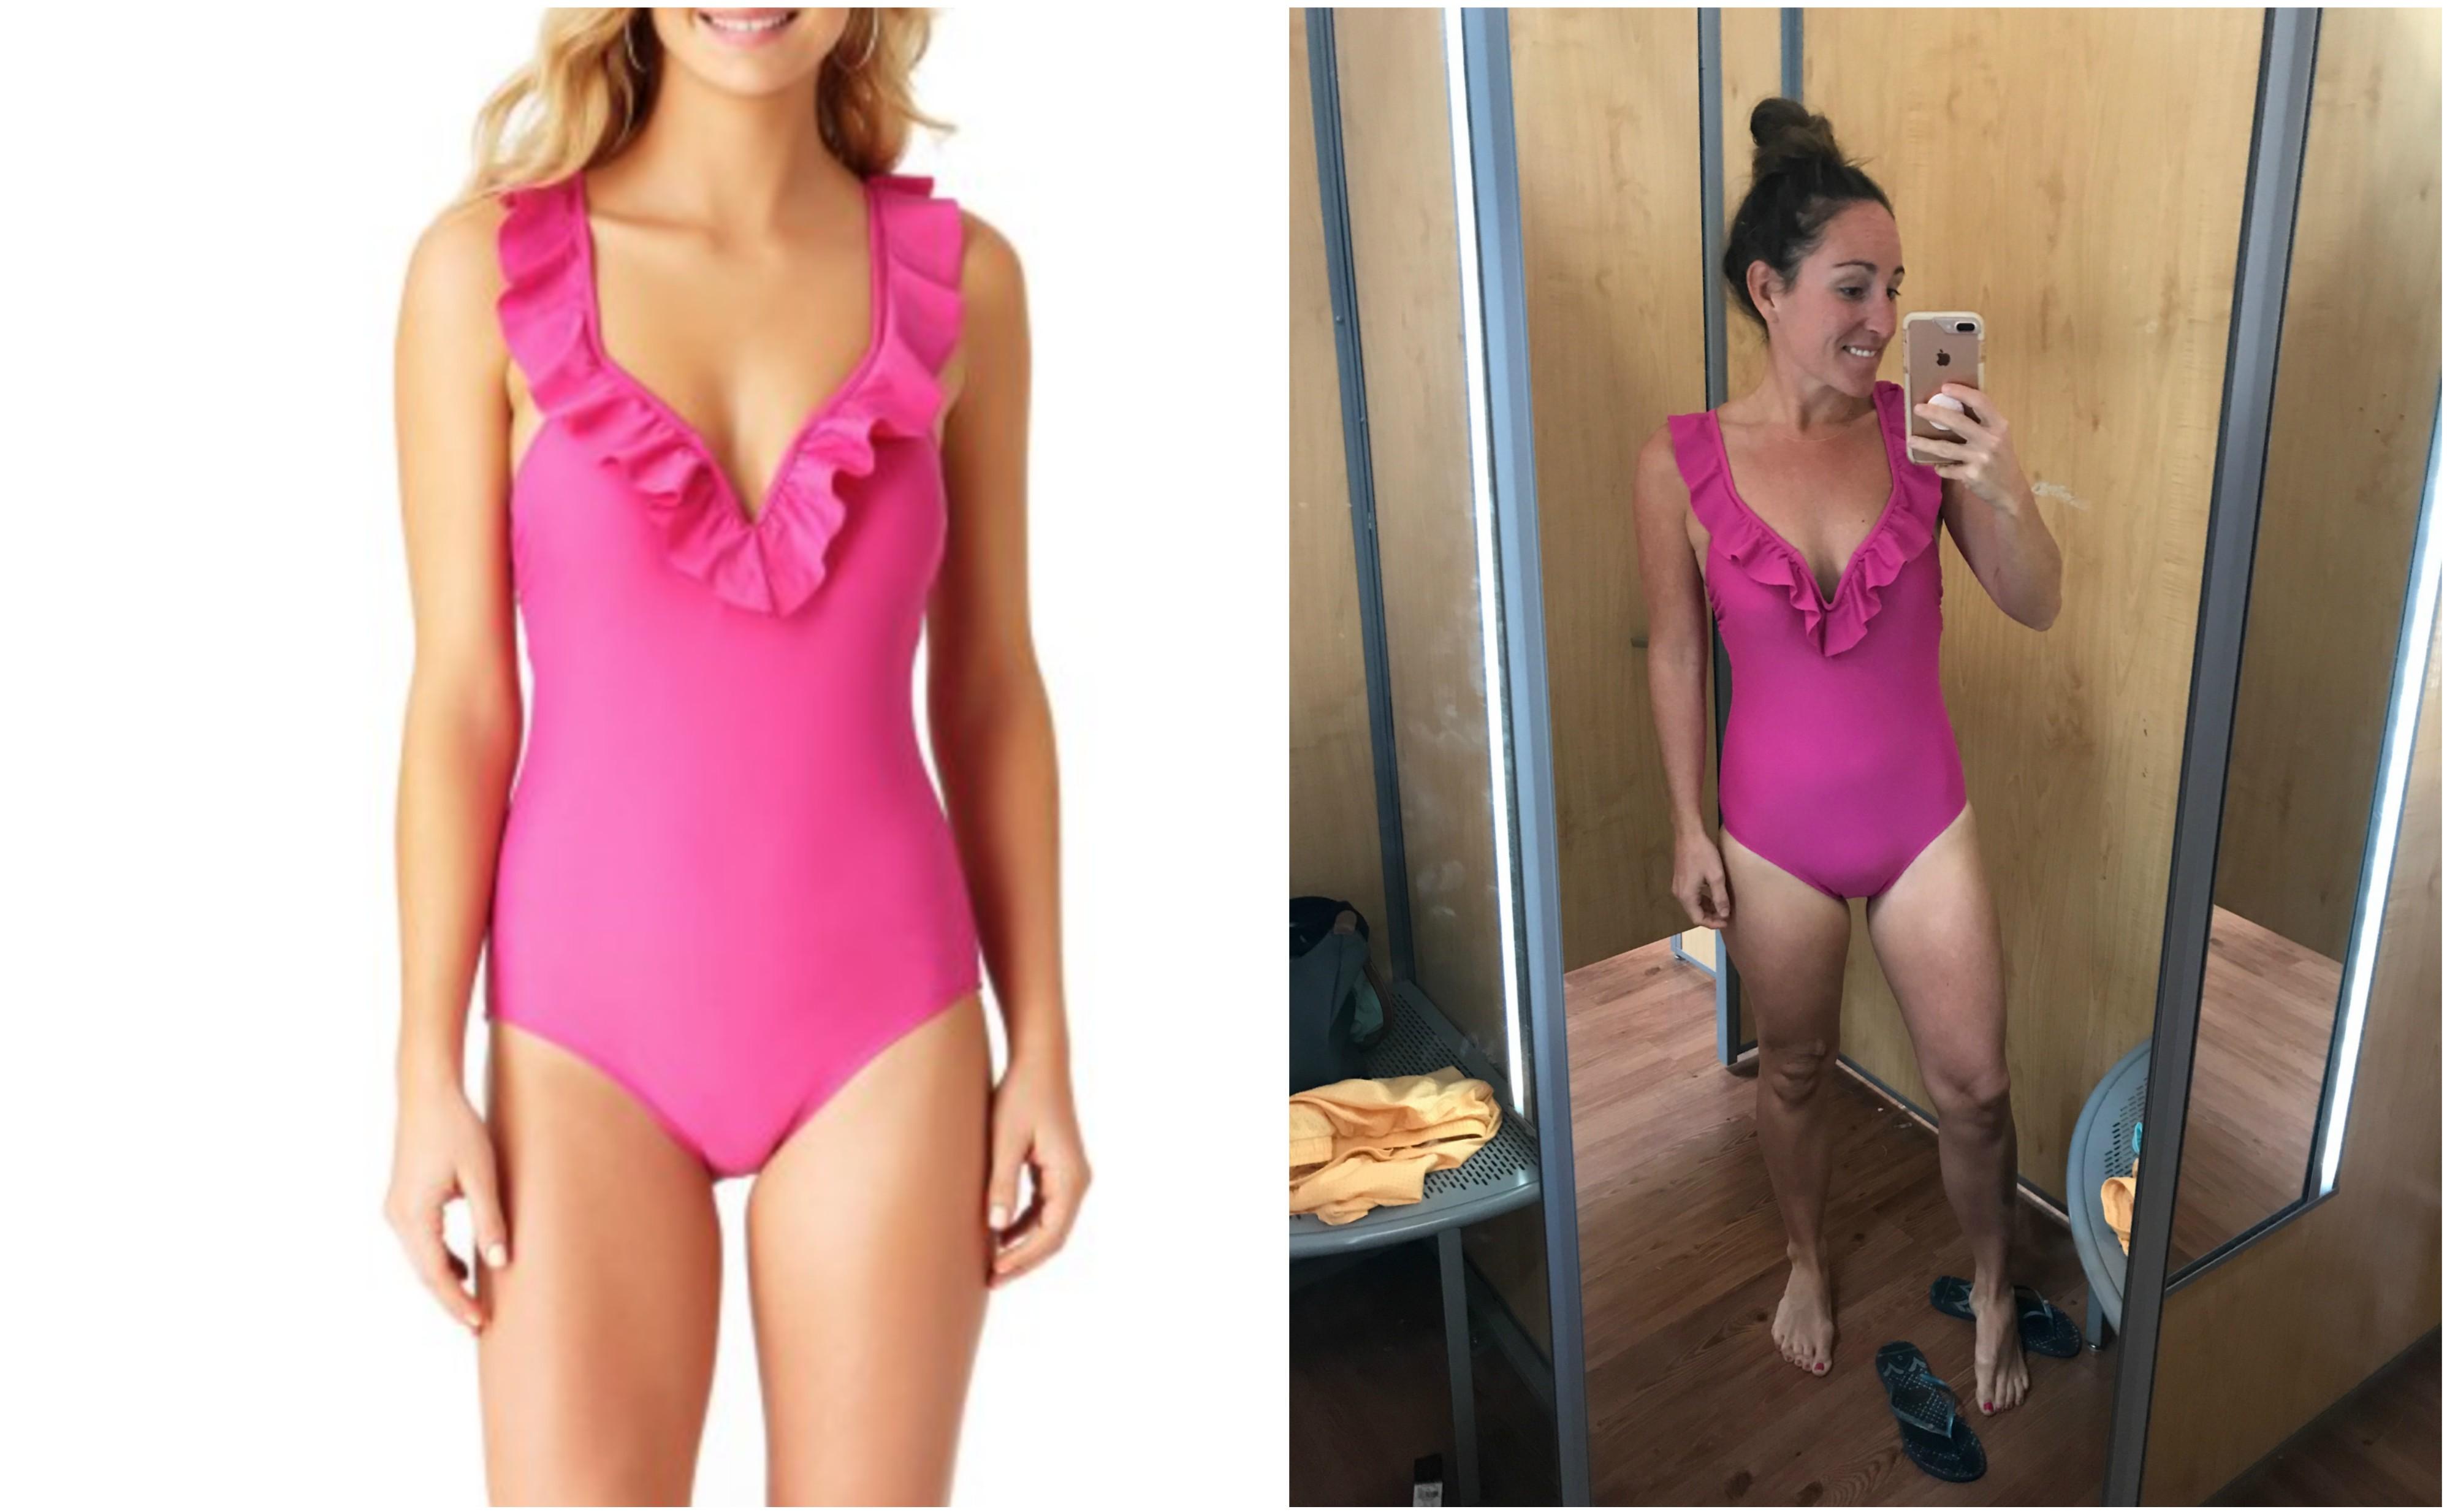 Walmart Pink Swimsuit - 5 on Friday - Communikait by Kait Hanson